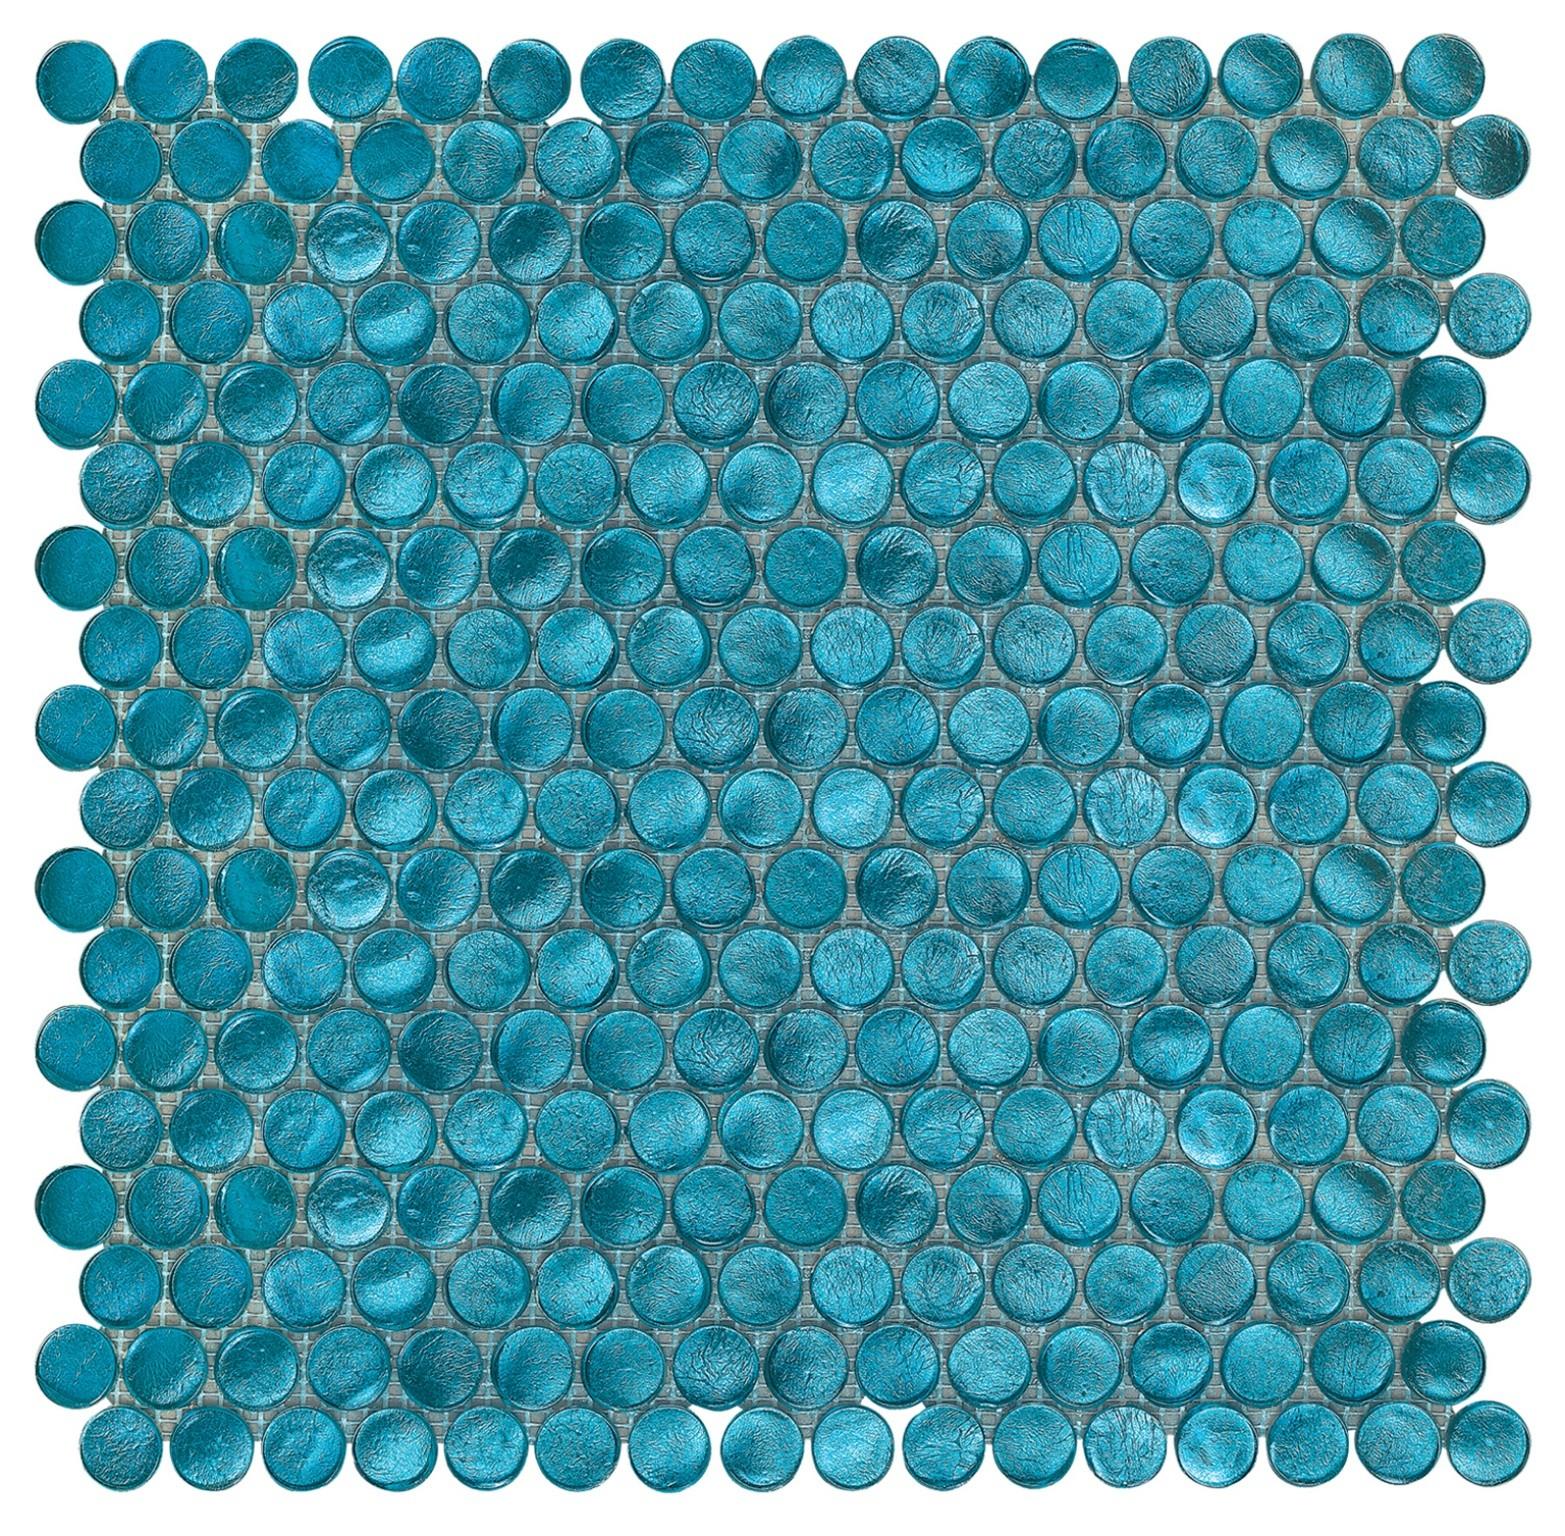 Interglass Penny Round Mosaic American tiles. Interceramic. Where to buy